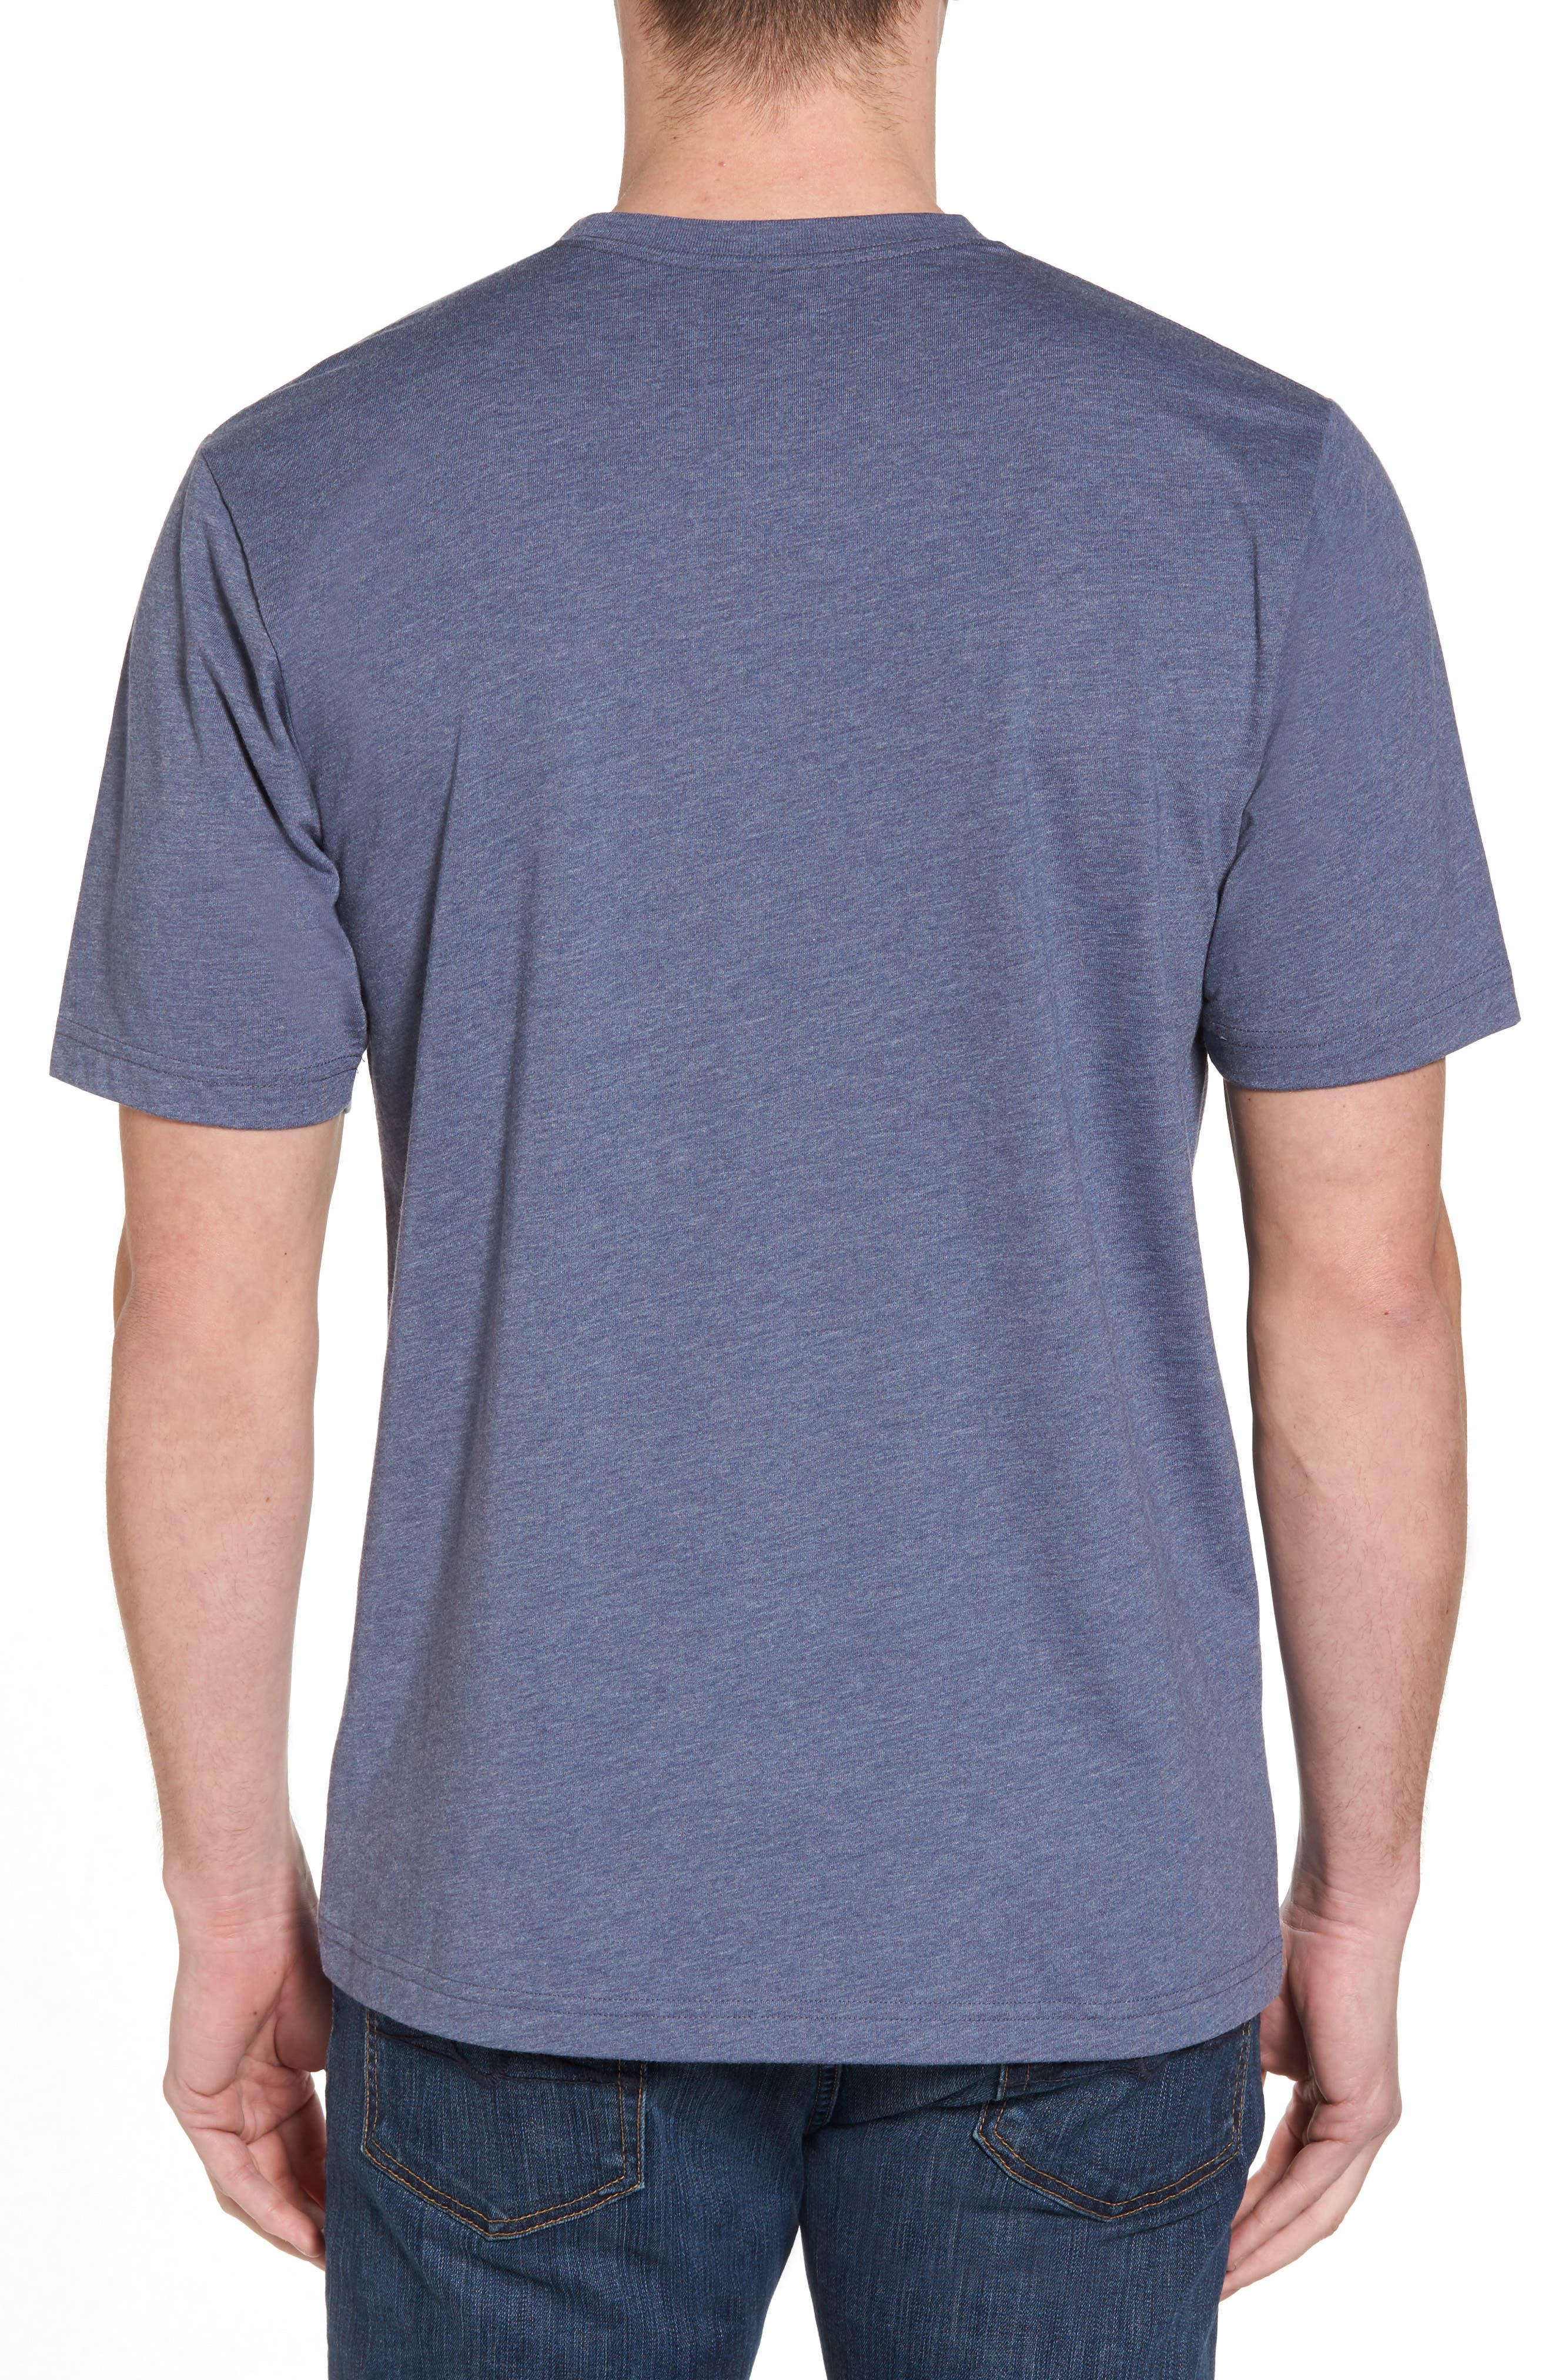 Drebo Graphic T-Shirt,                             Alternate thumbnail 2, color,                             Heather Blue Nights